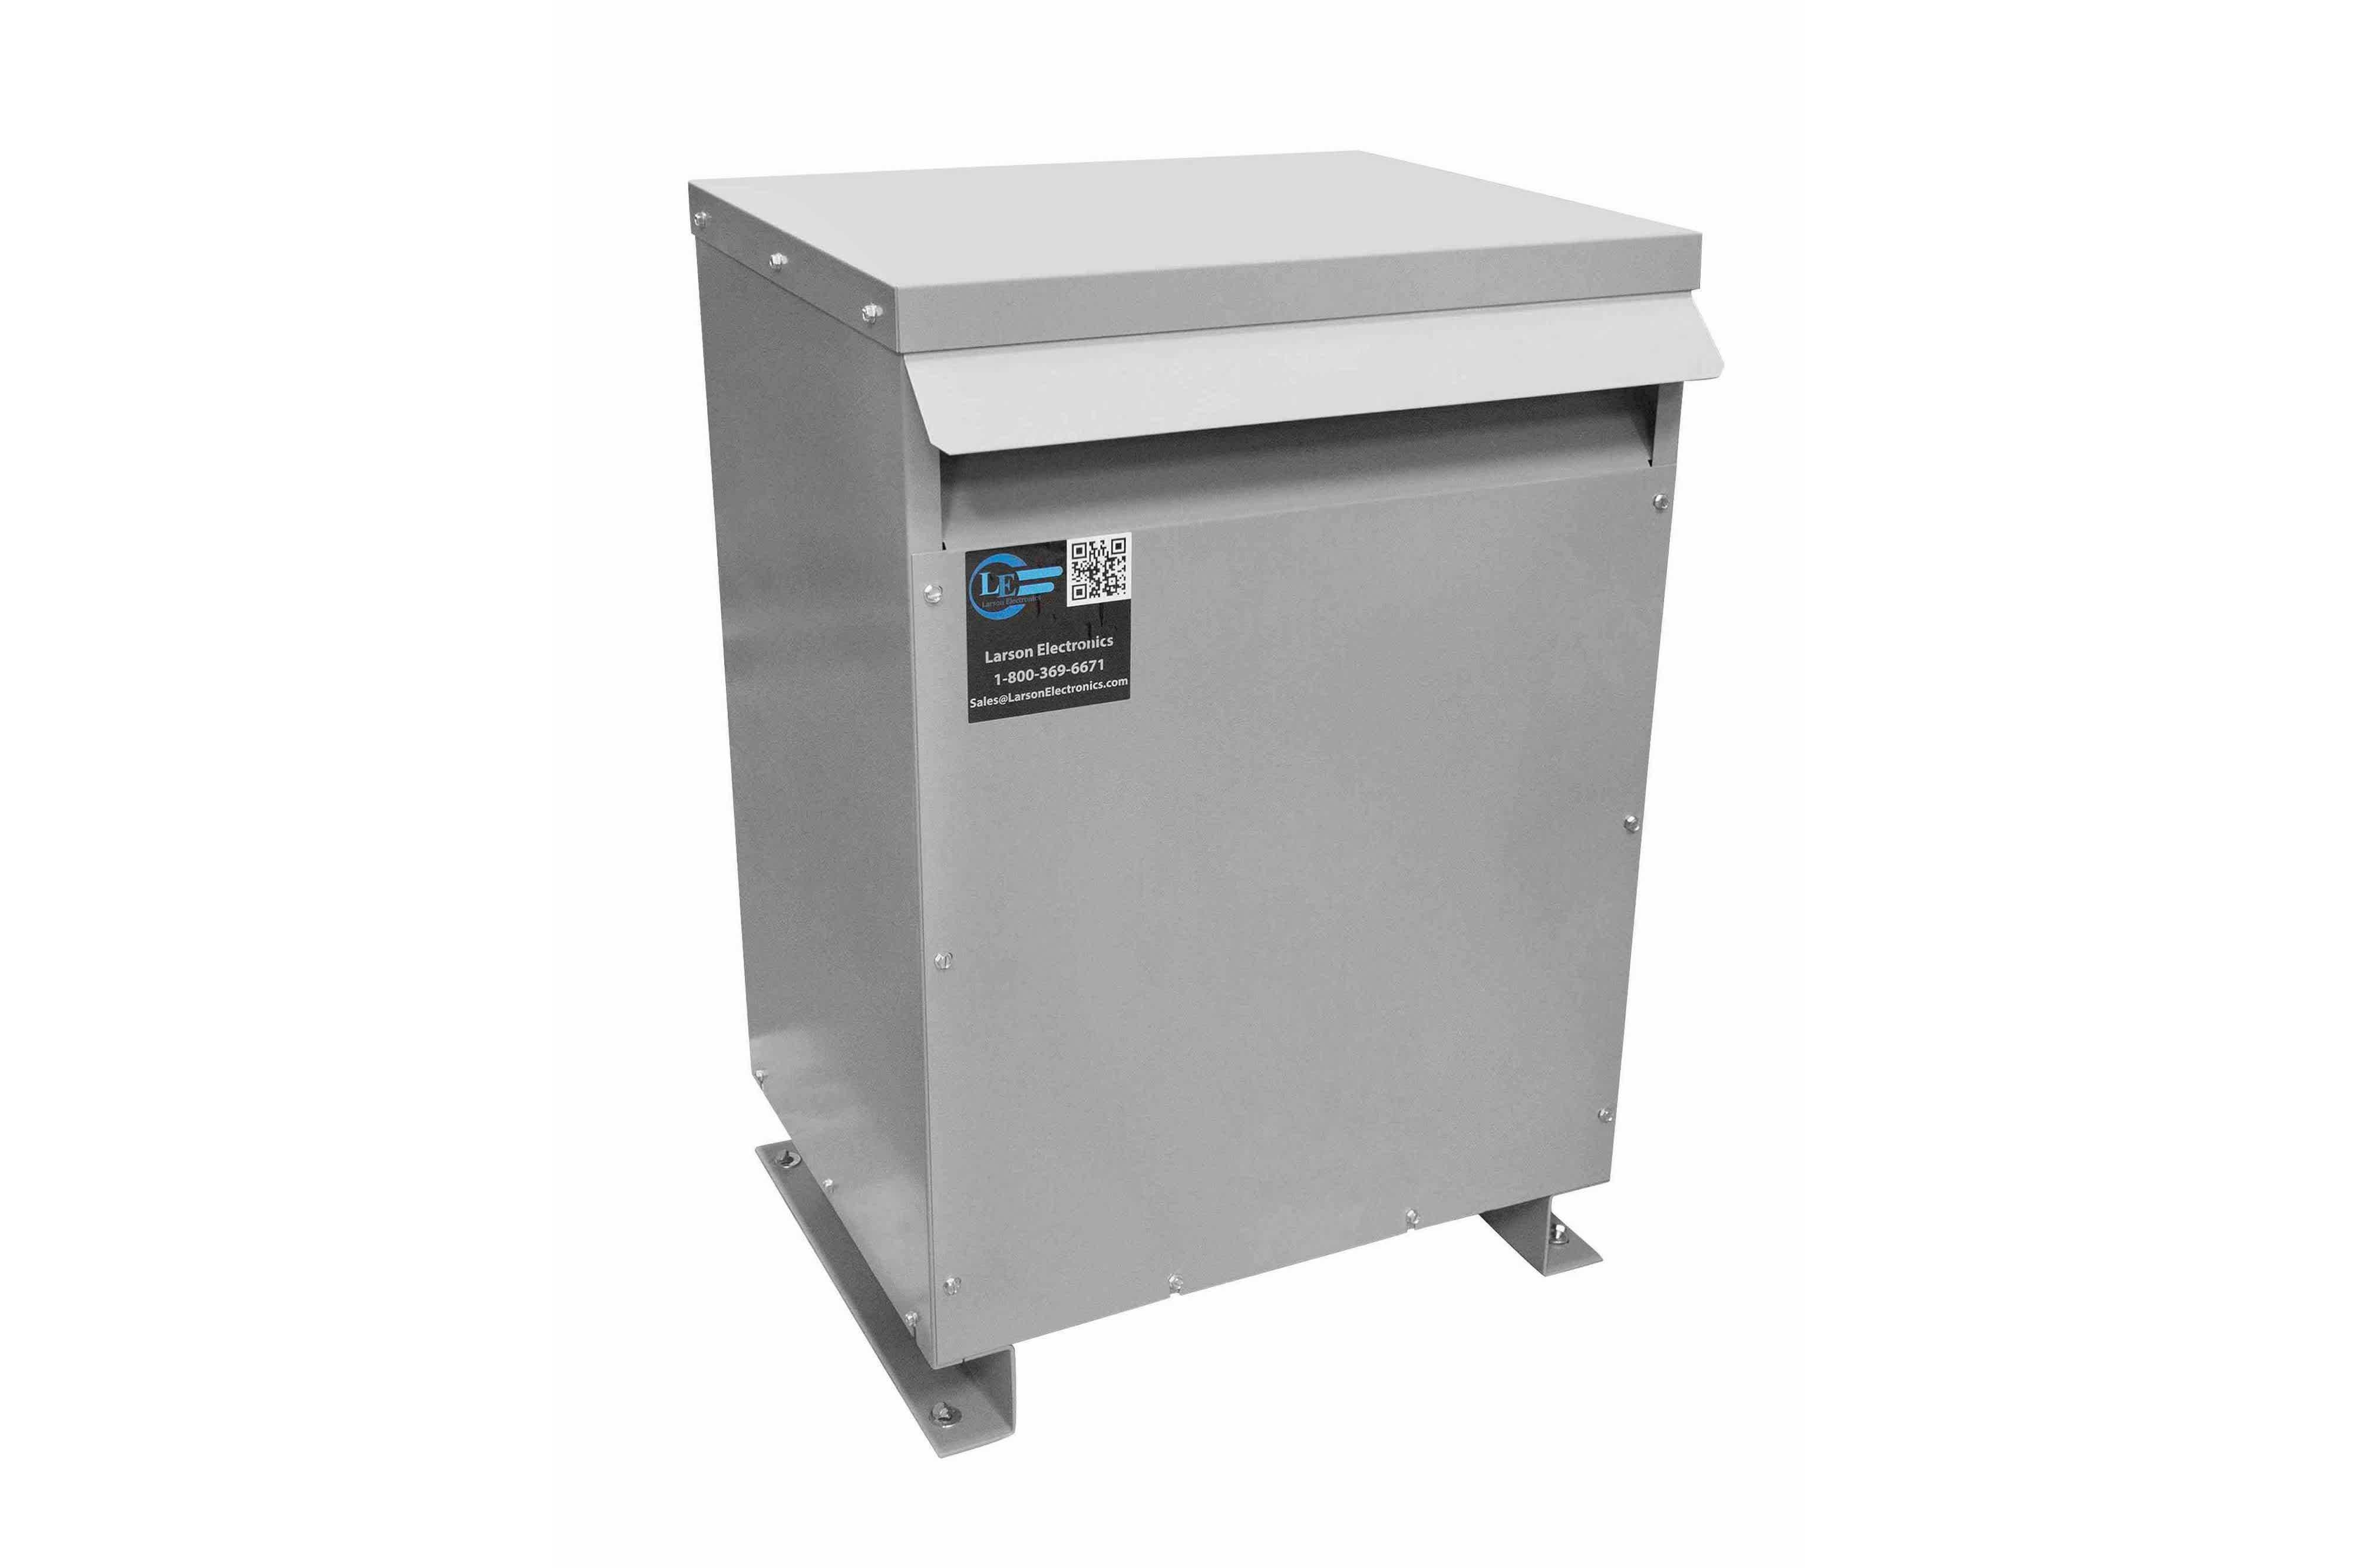 75 kVA 3PH DOE Transformer, 208V Delta Primary, 208Y/120 Wye-N Secondary, N3R, Ventilated, 60 Hz